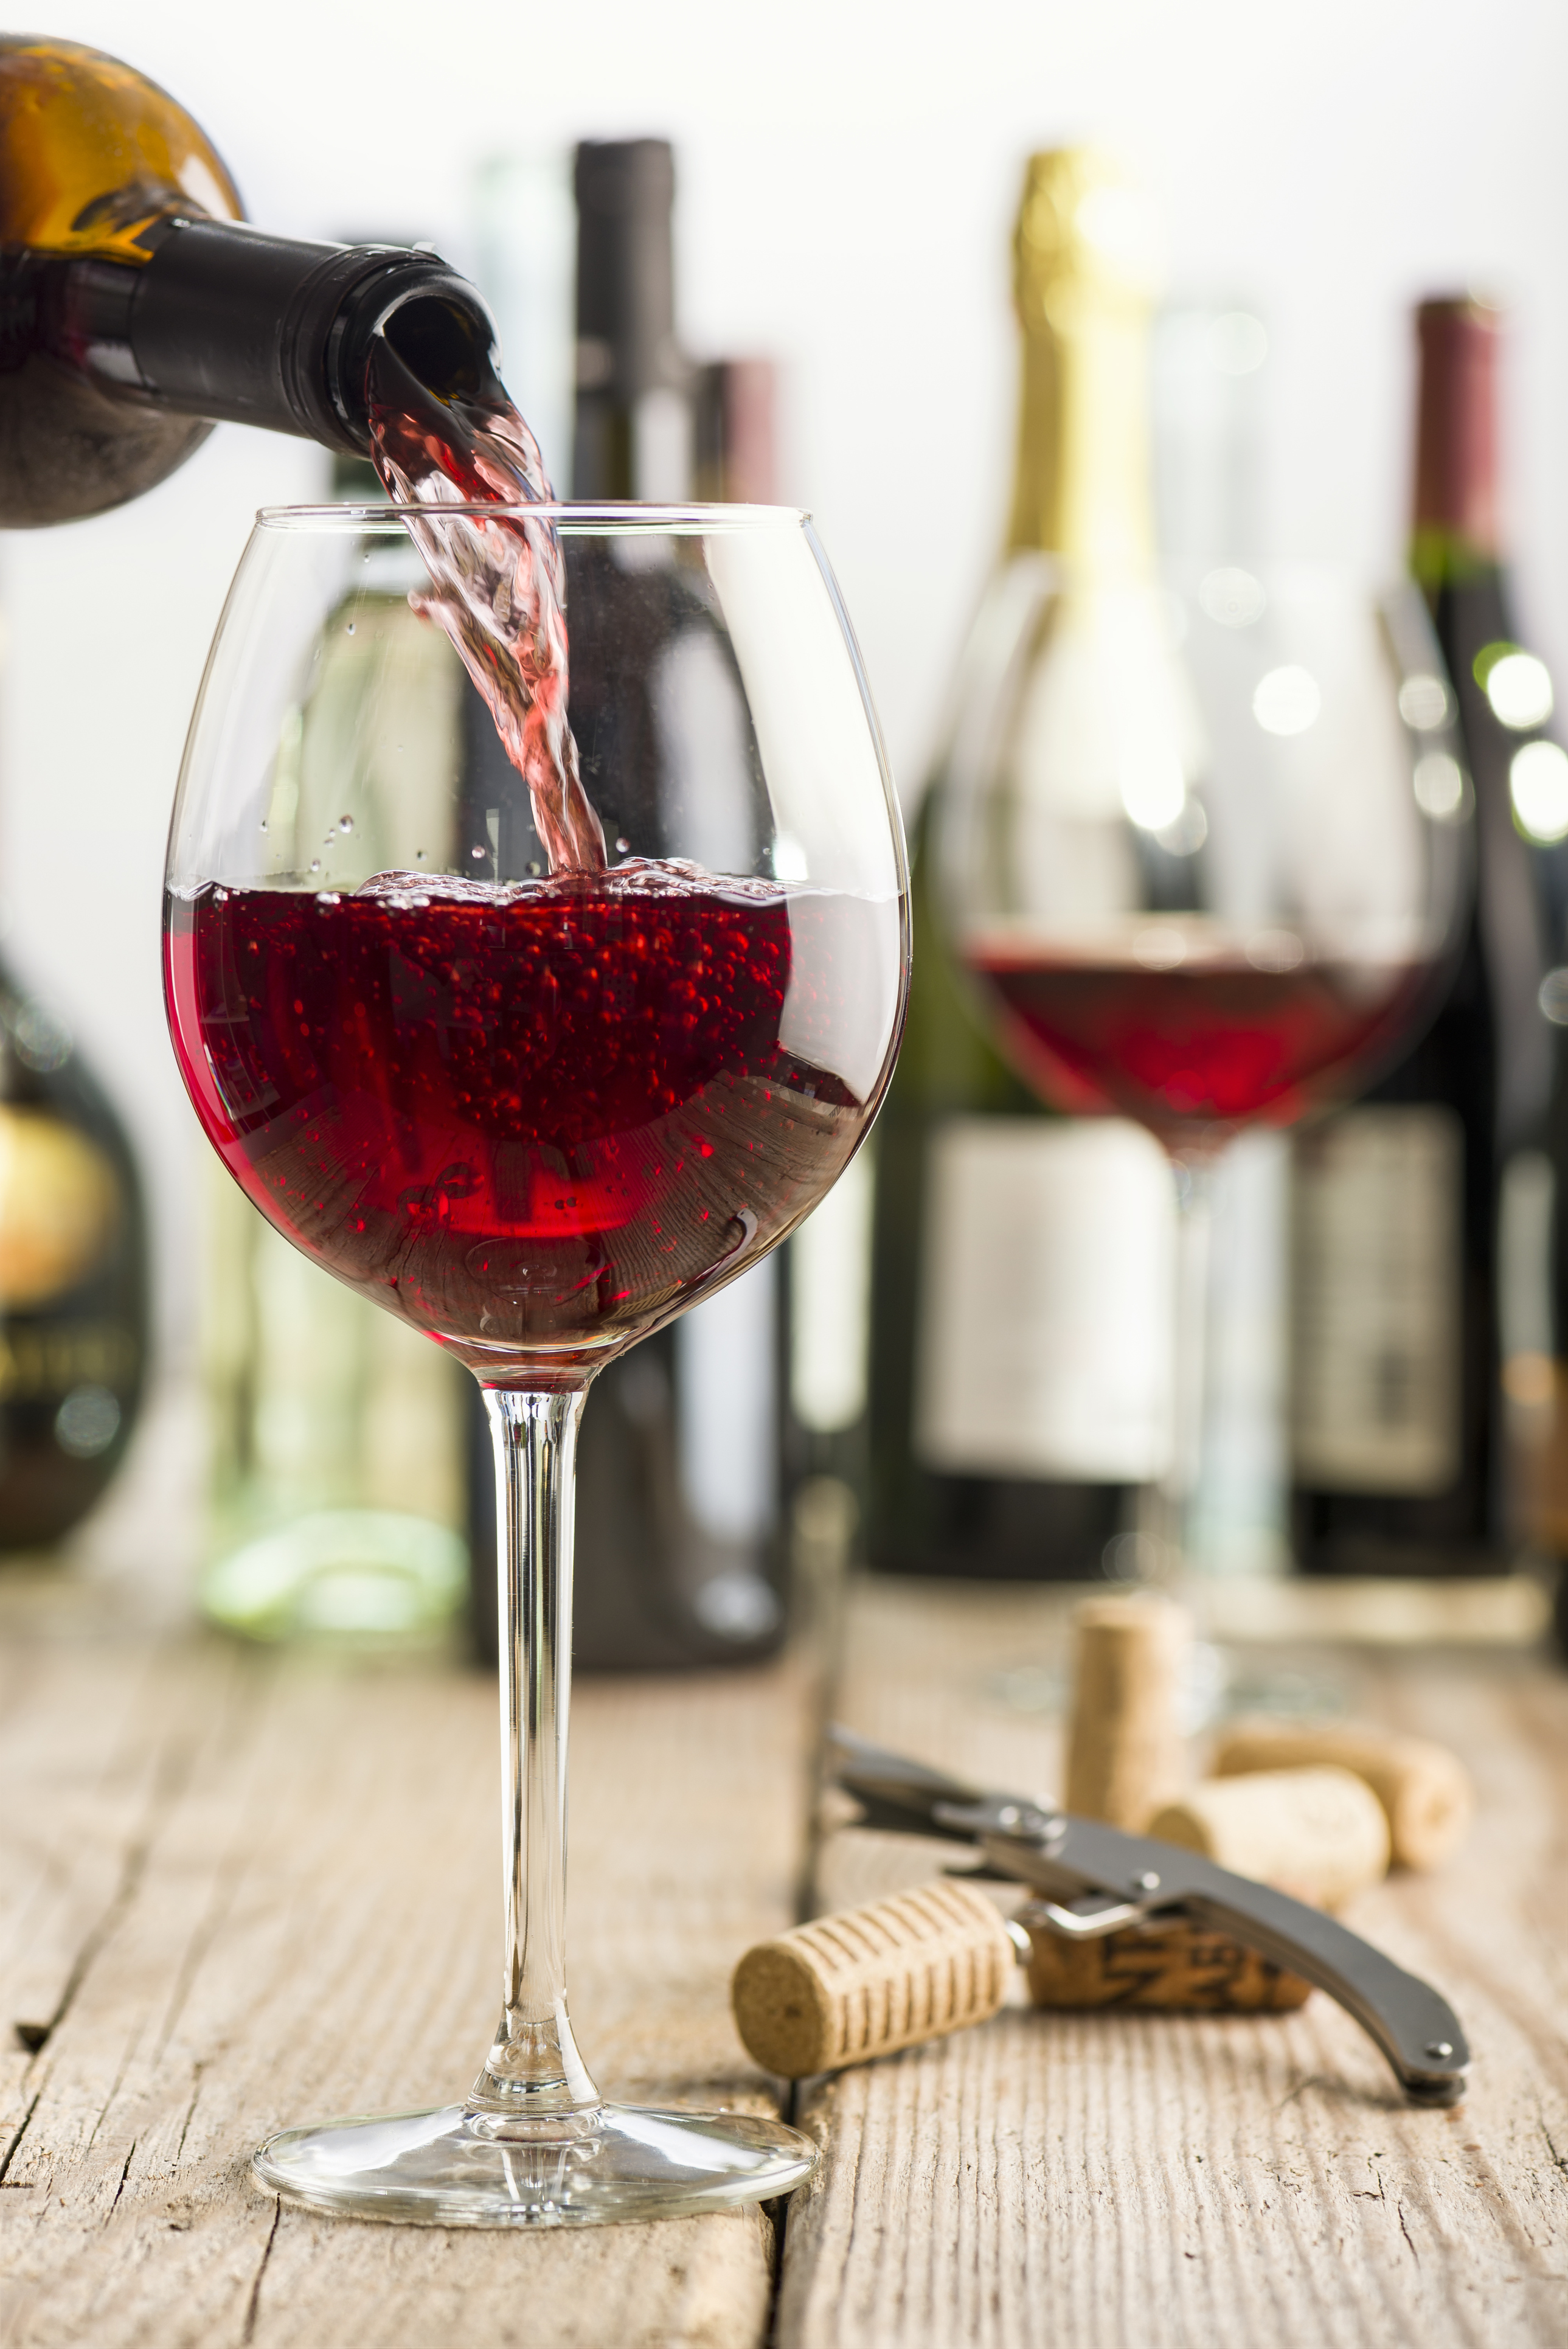 Winter Wine Tasting At Keystone Resort February 17 Keystone Vacation Rentals By Summitcove Property Management